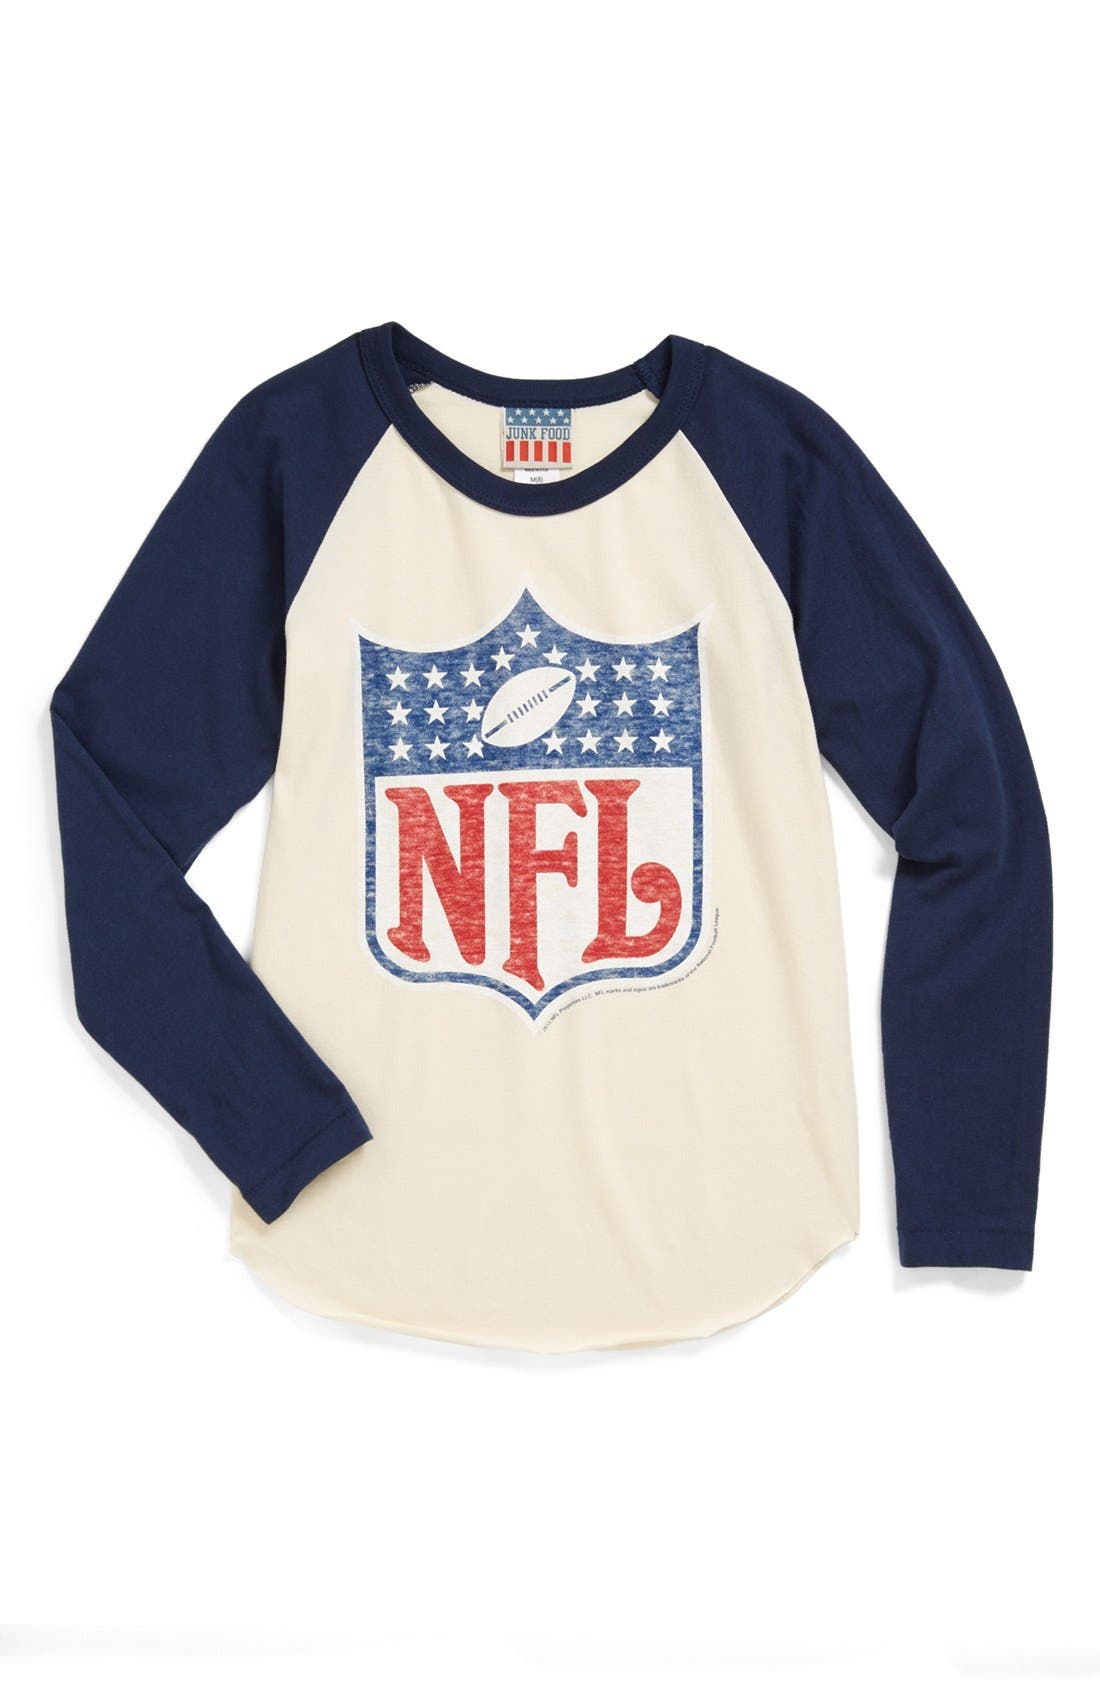 Main Image - Junk Food 'NFL Shield' Raglan Long Sleeve T-Shirt (Little Boys & Big Boys)